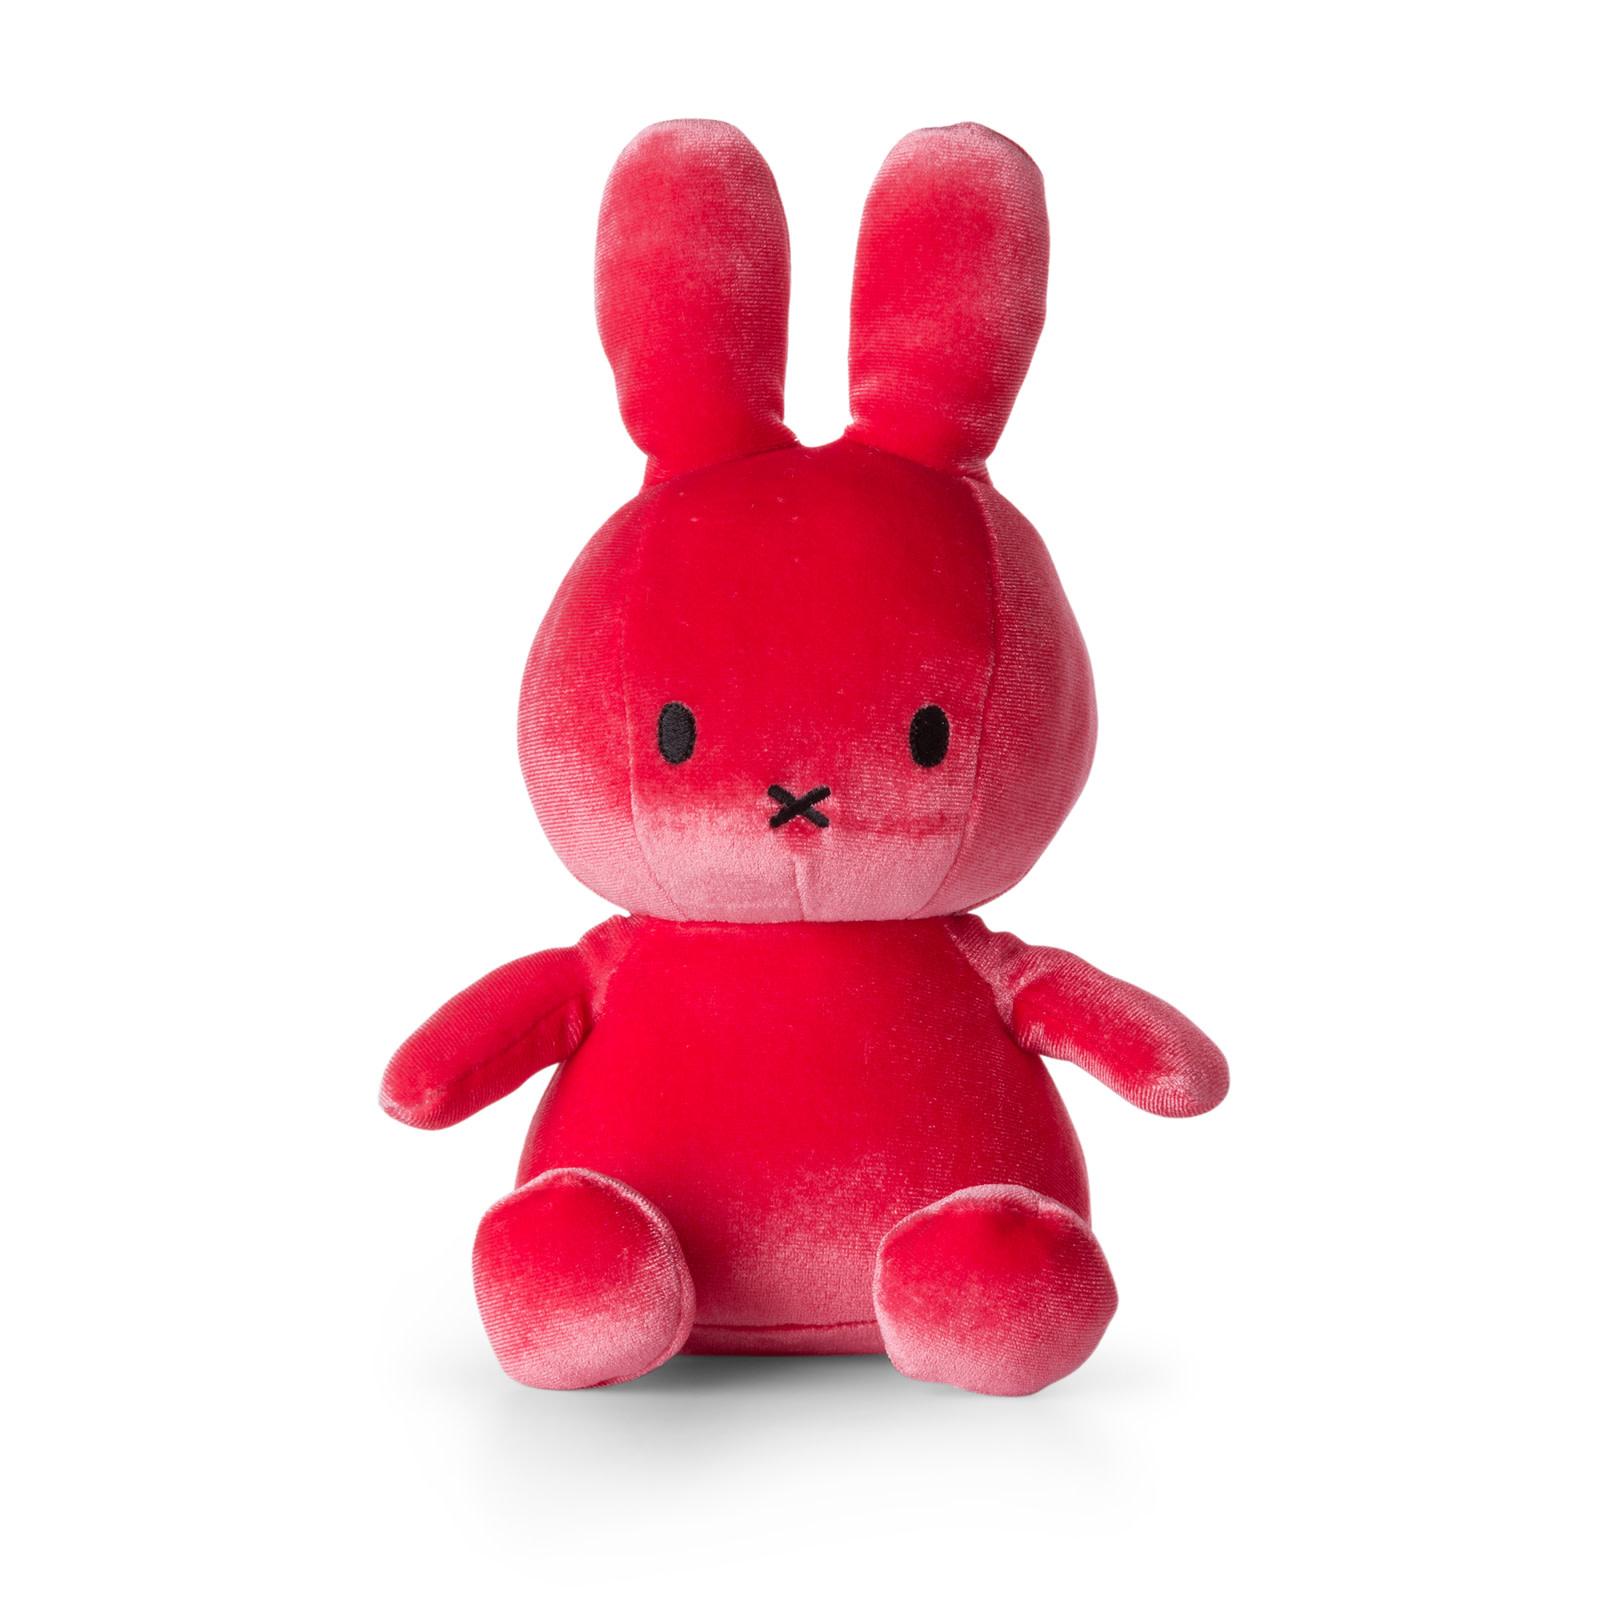 Nijntje/Miffy/Snuffy Miffy Sitting Velvet Candy Pink - 23 cm - 9